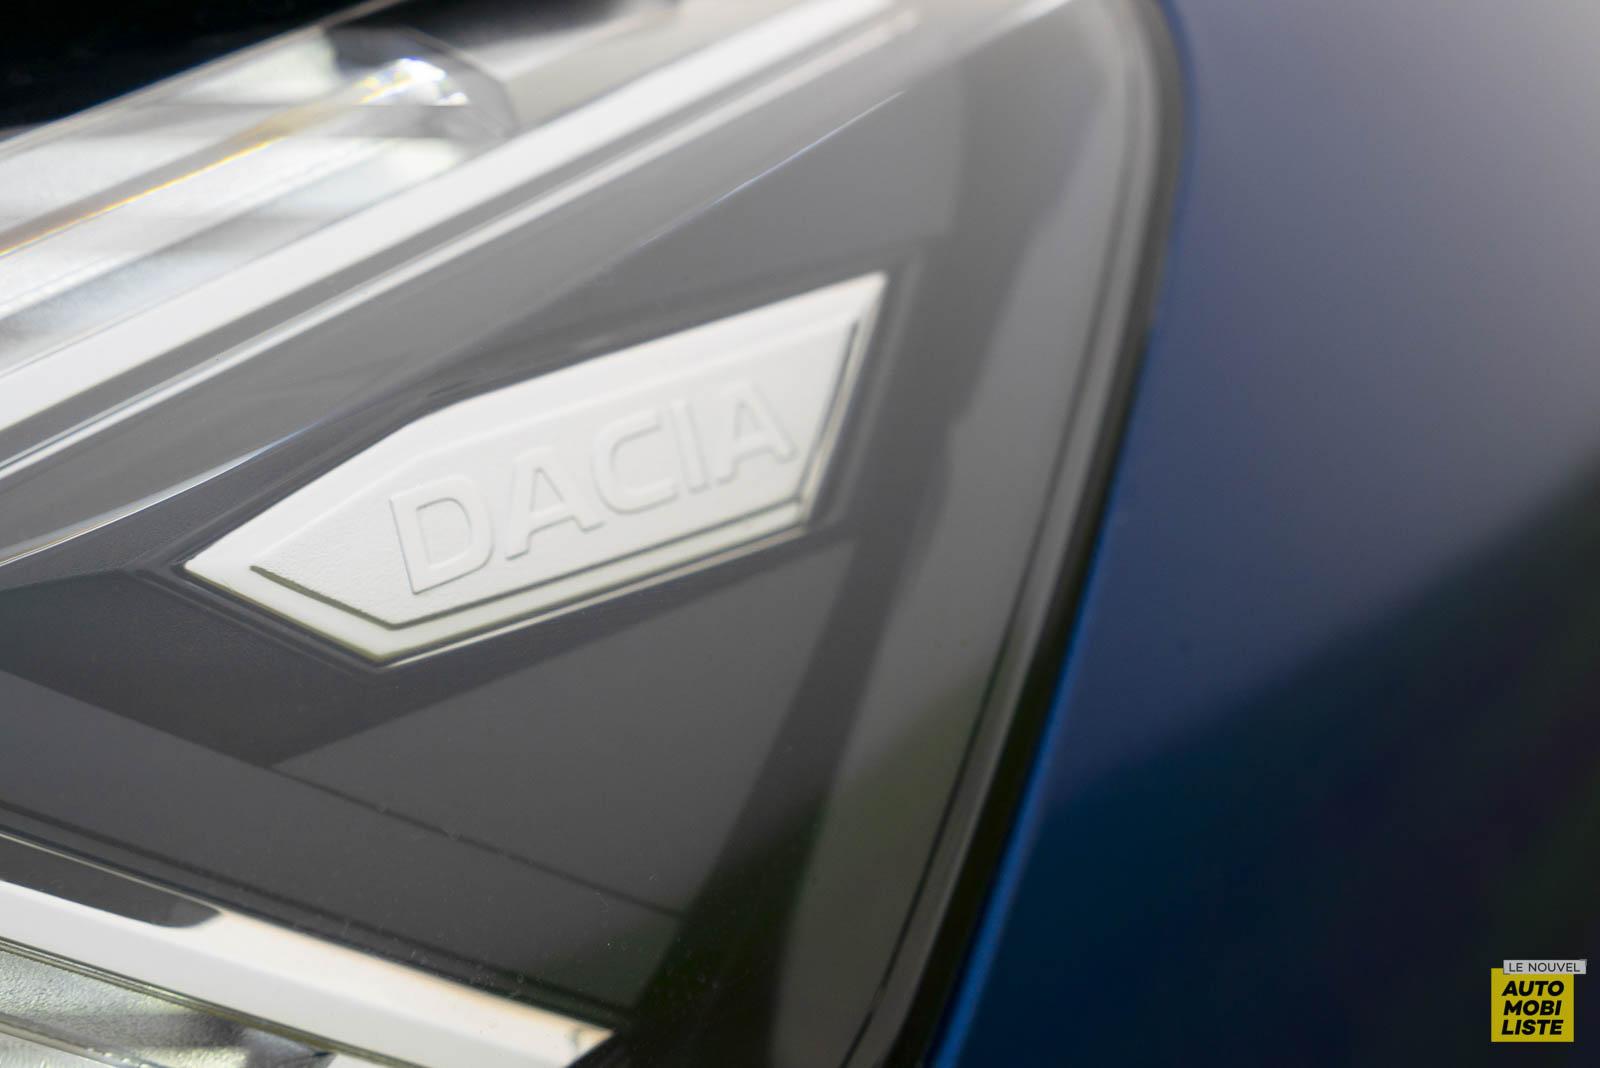 LNA 2011 Dacia Sandero TCe90 Comfort Ecterieur Detail 006